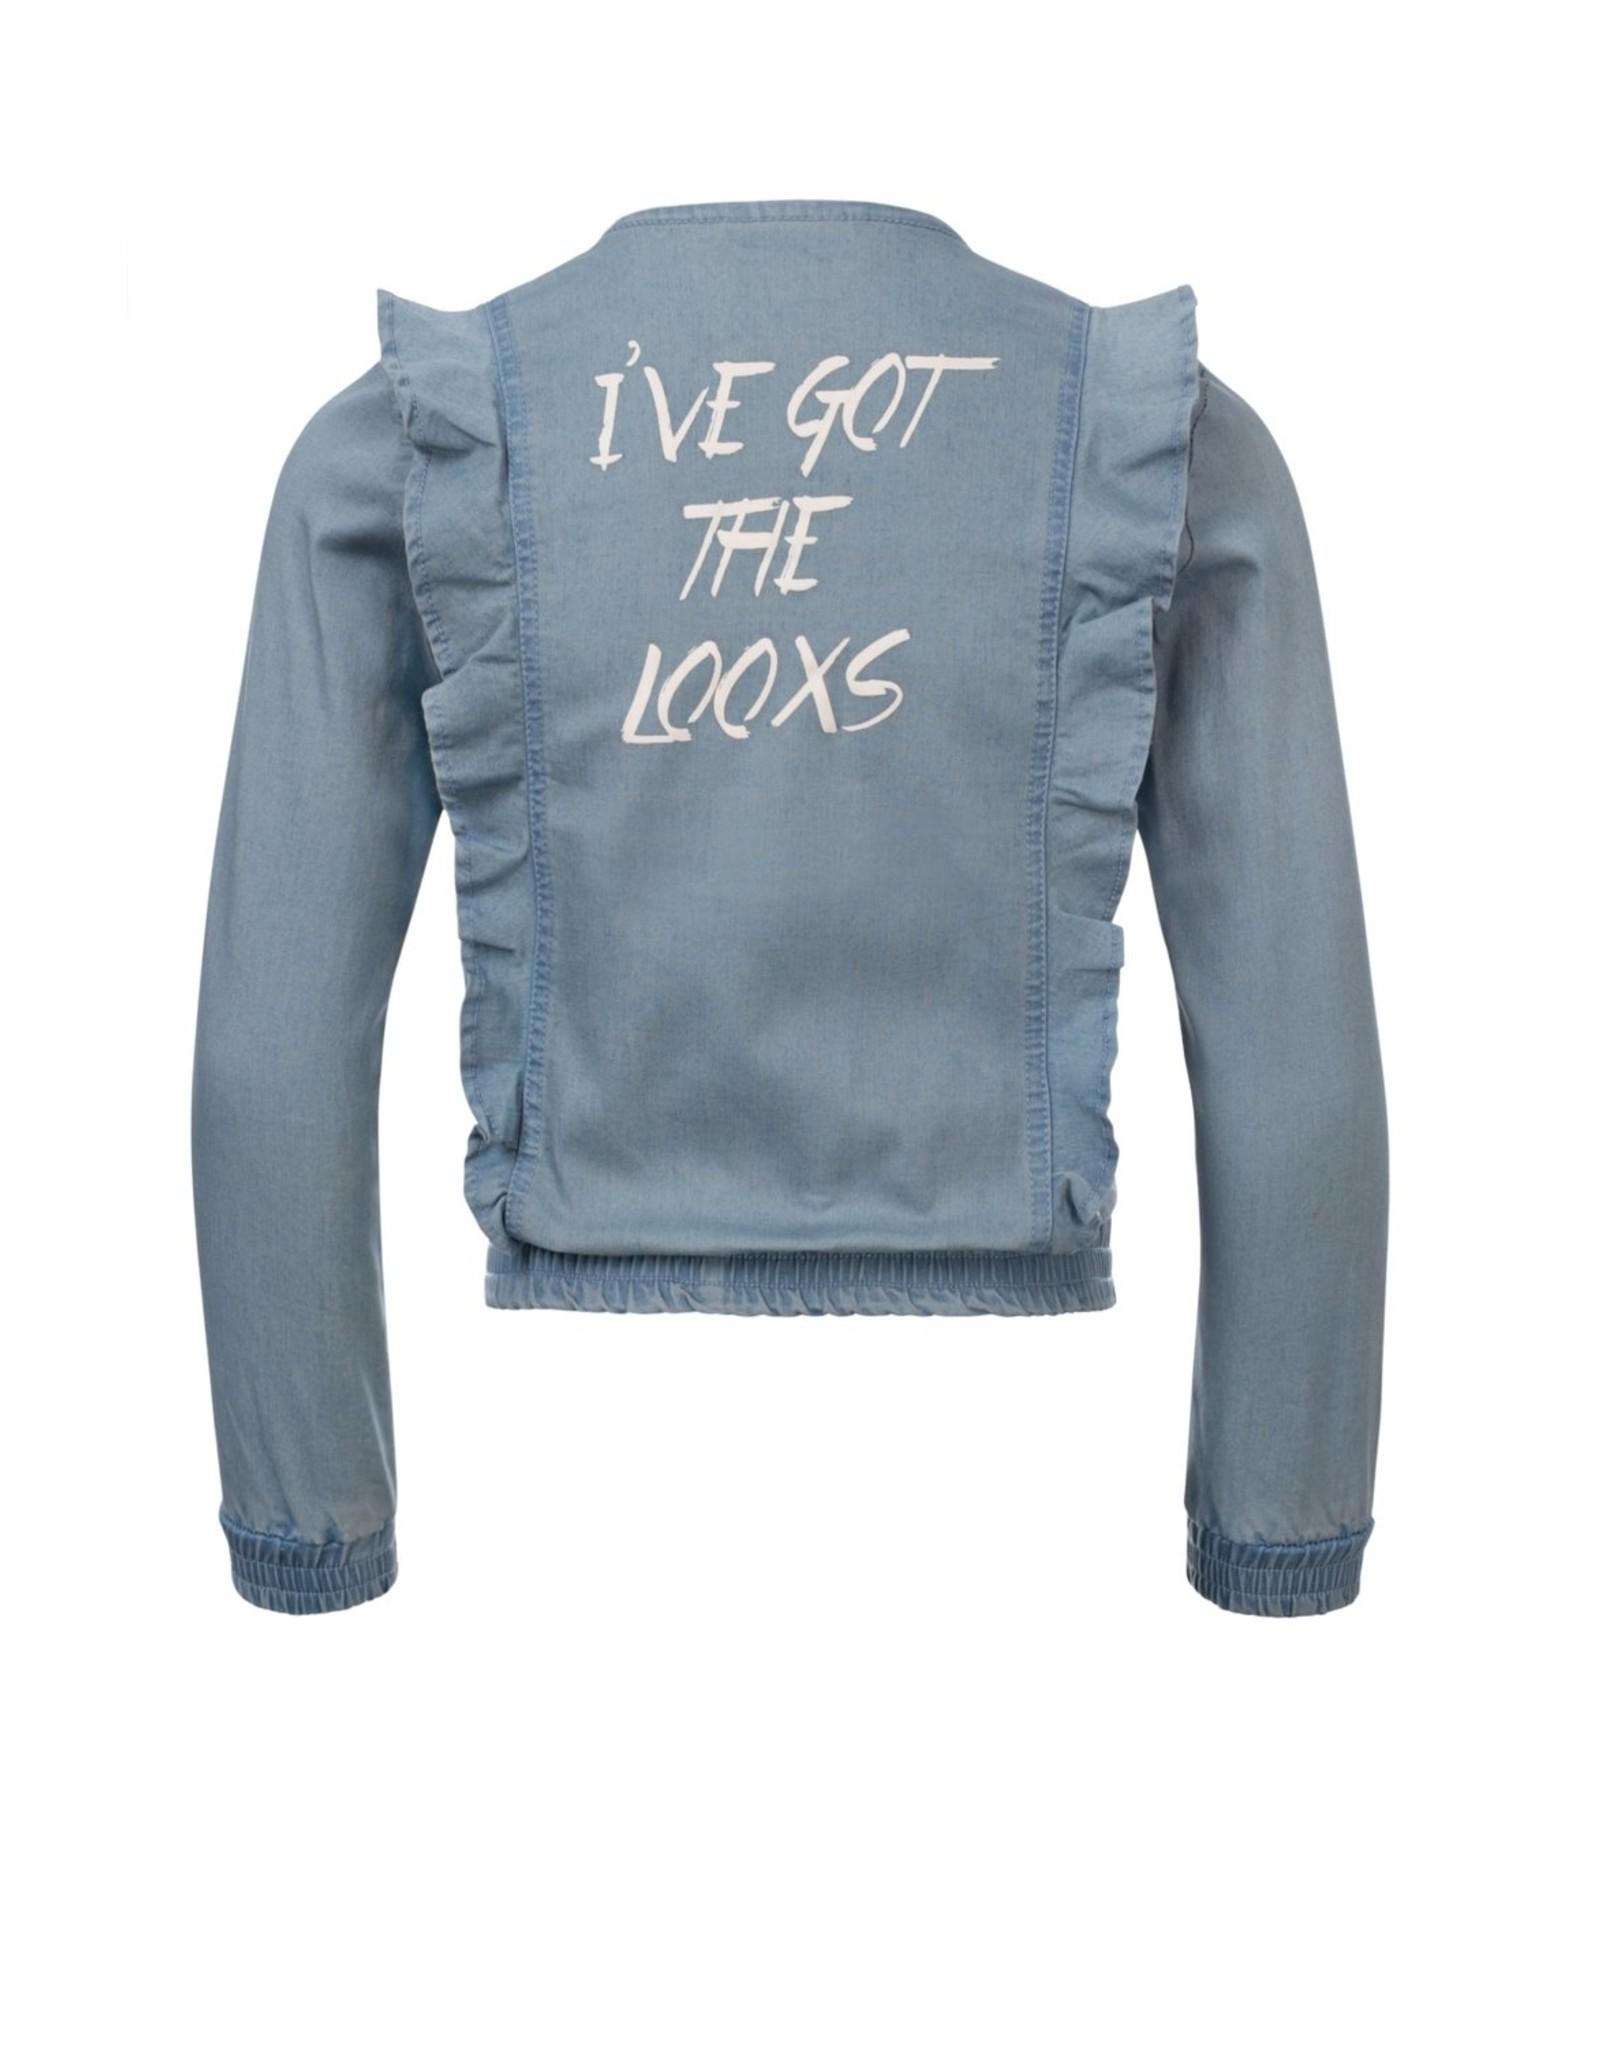 Looxs Revolution Little denim jacket